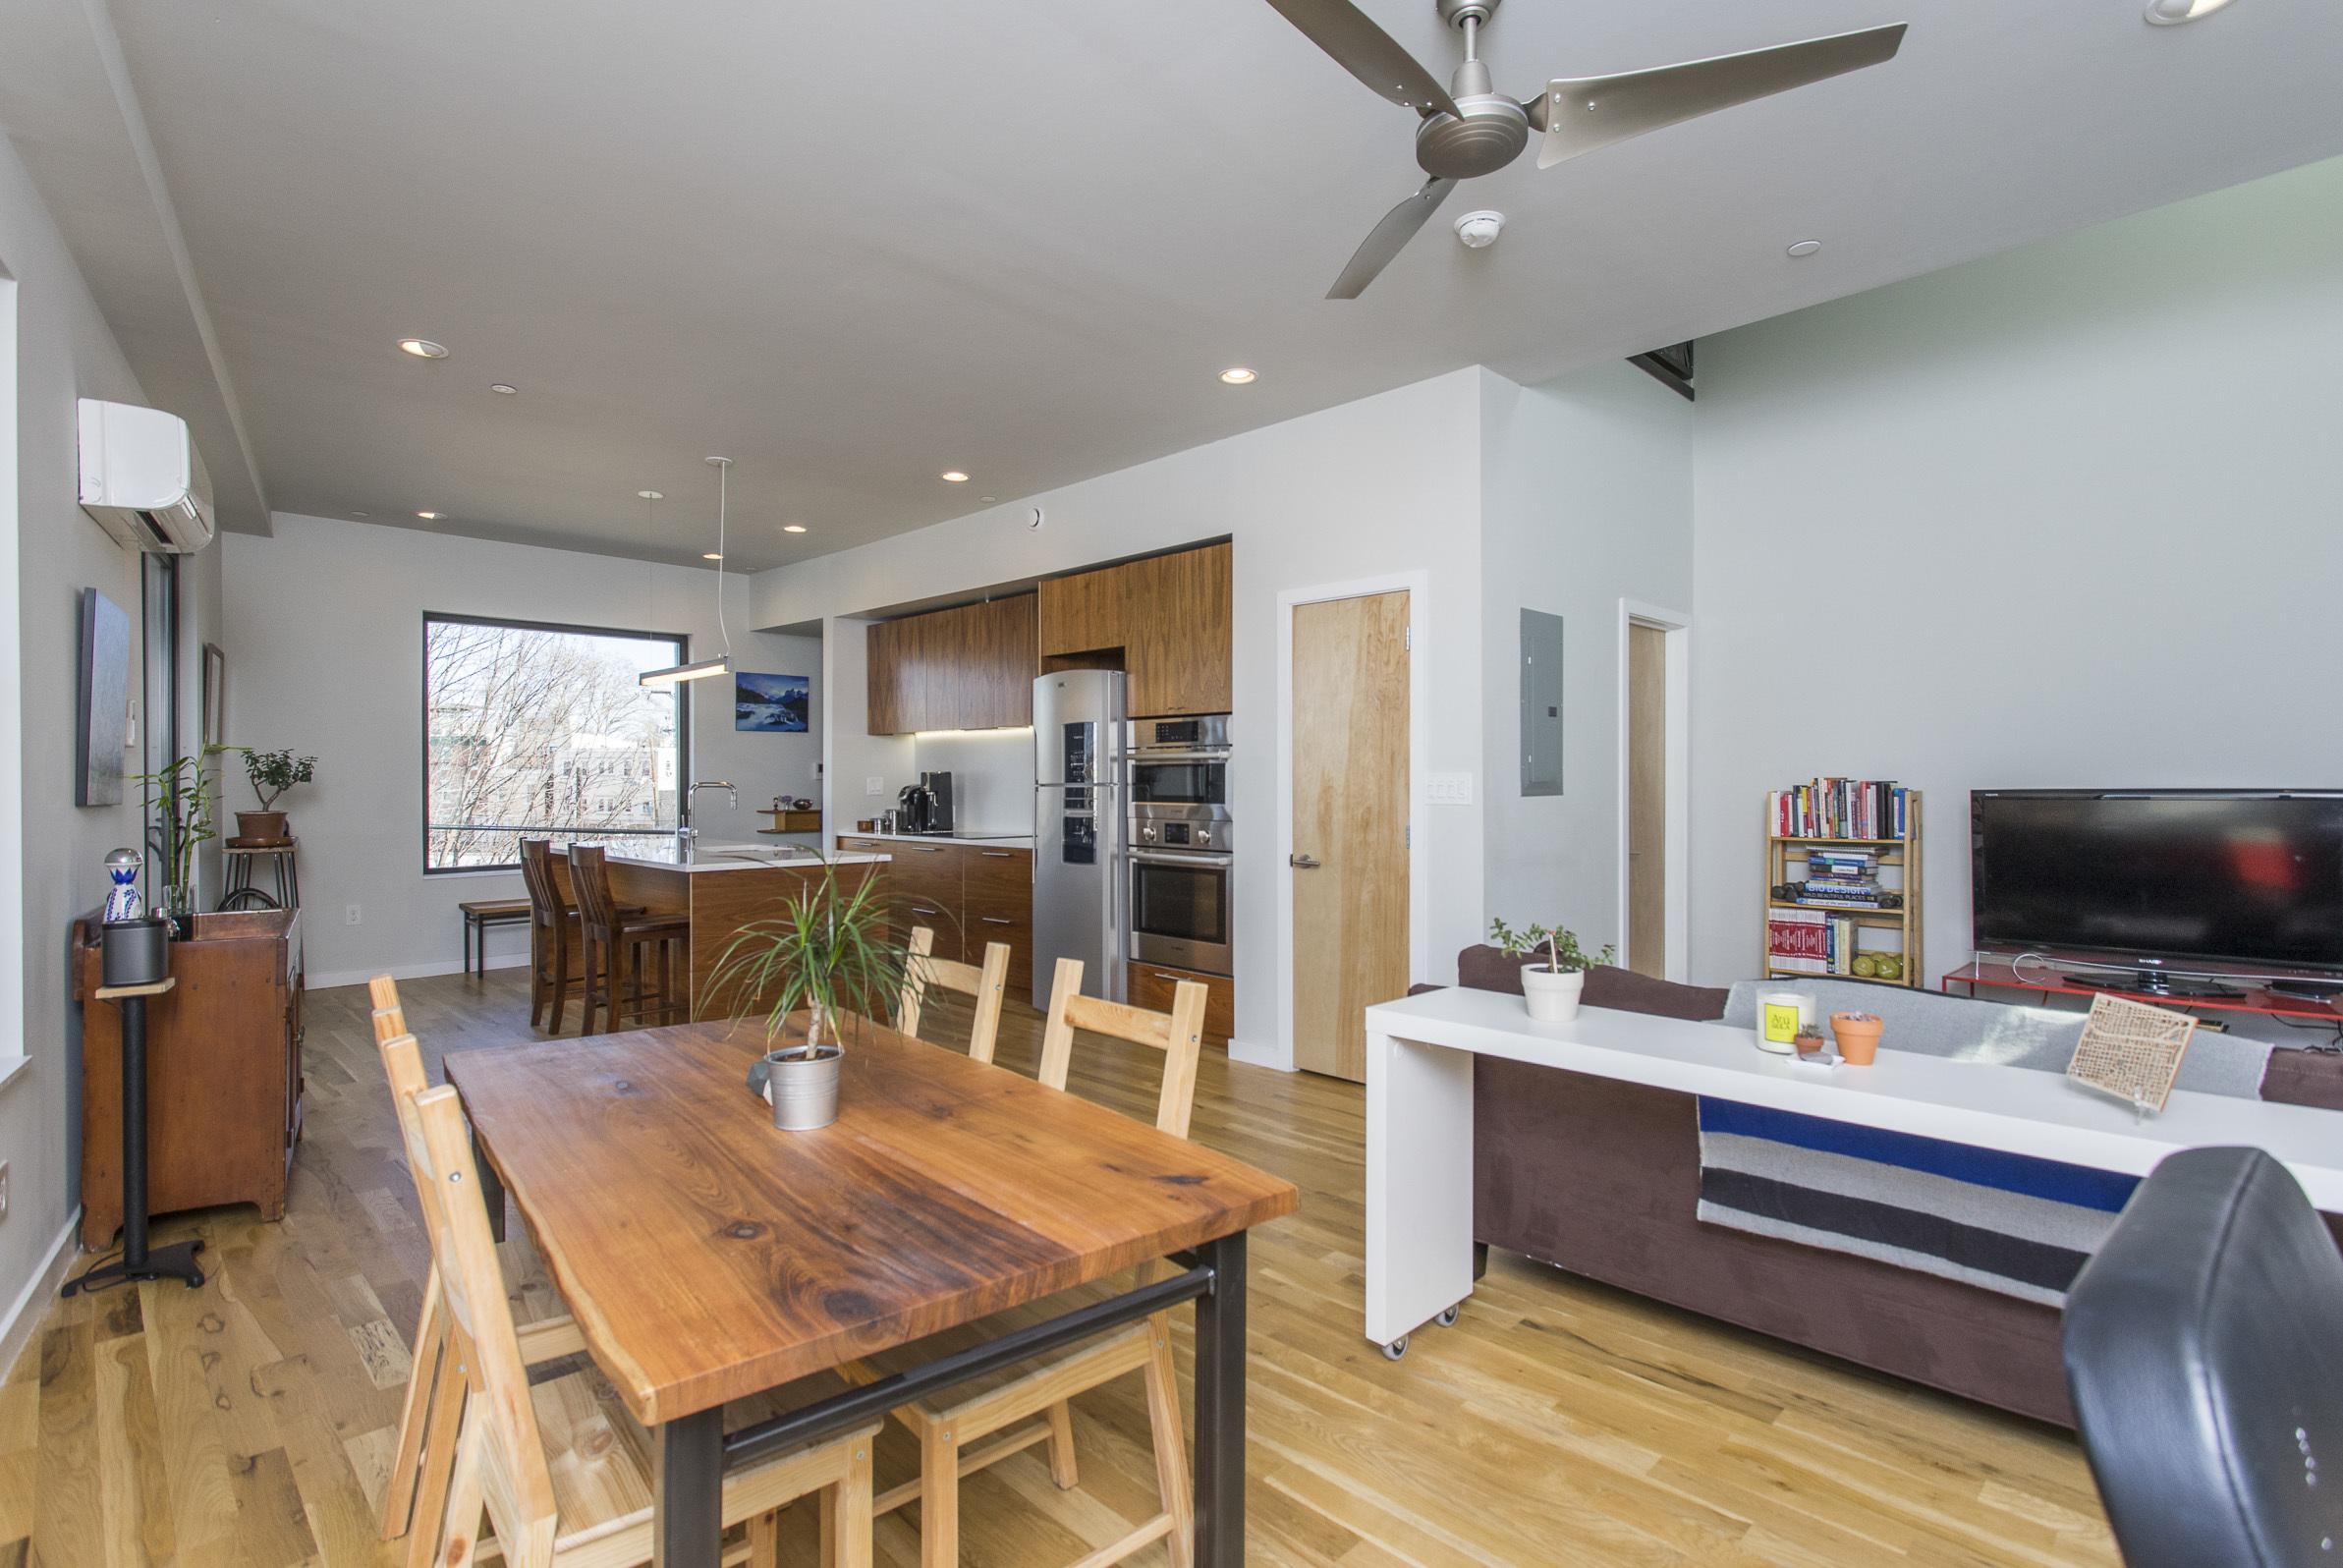 Apartment for Rent in Philadelphia